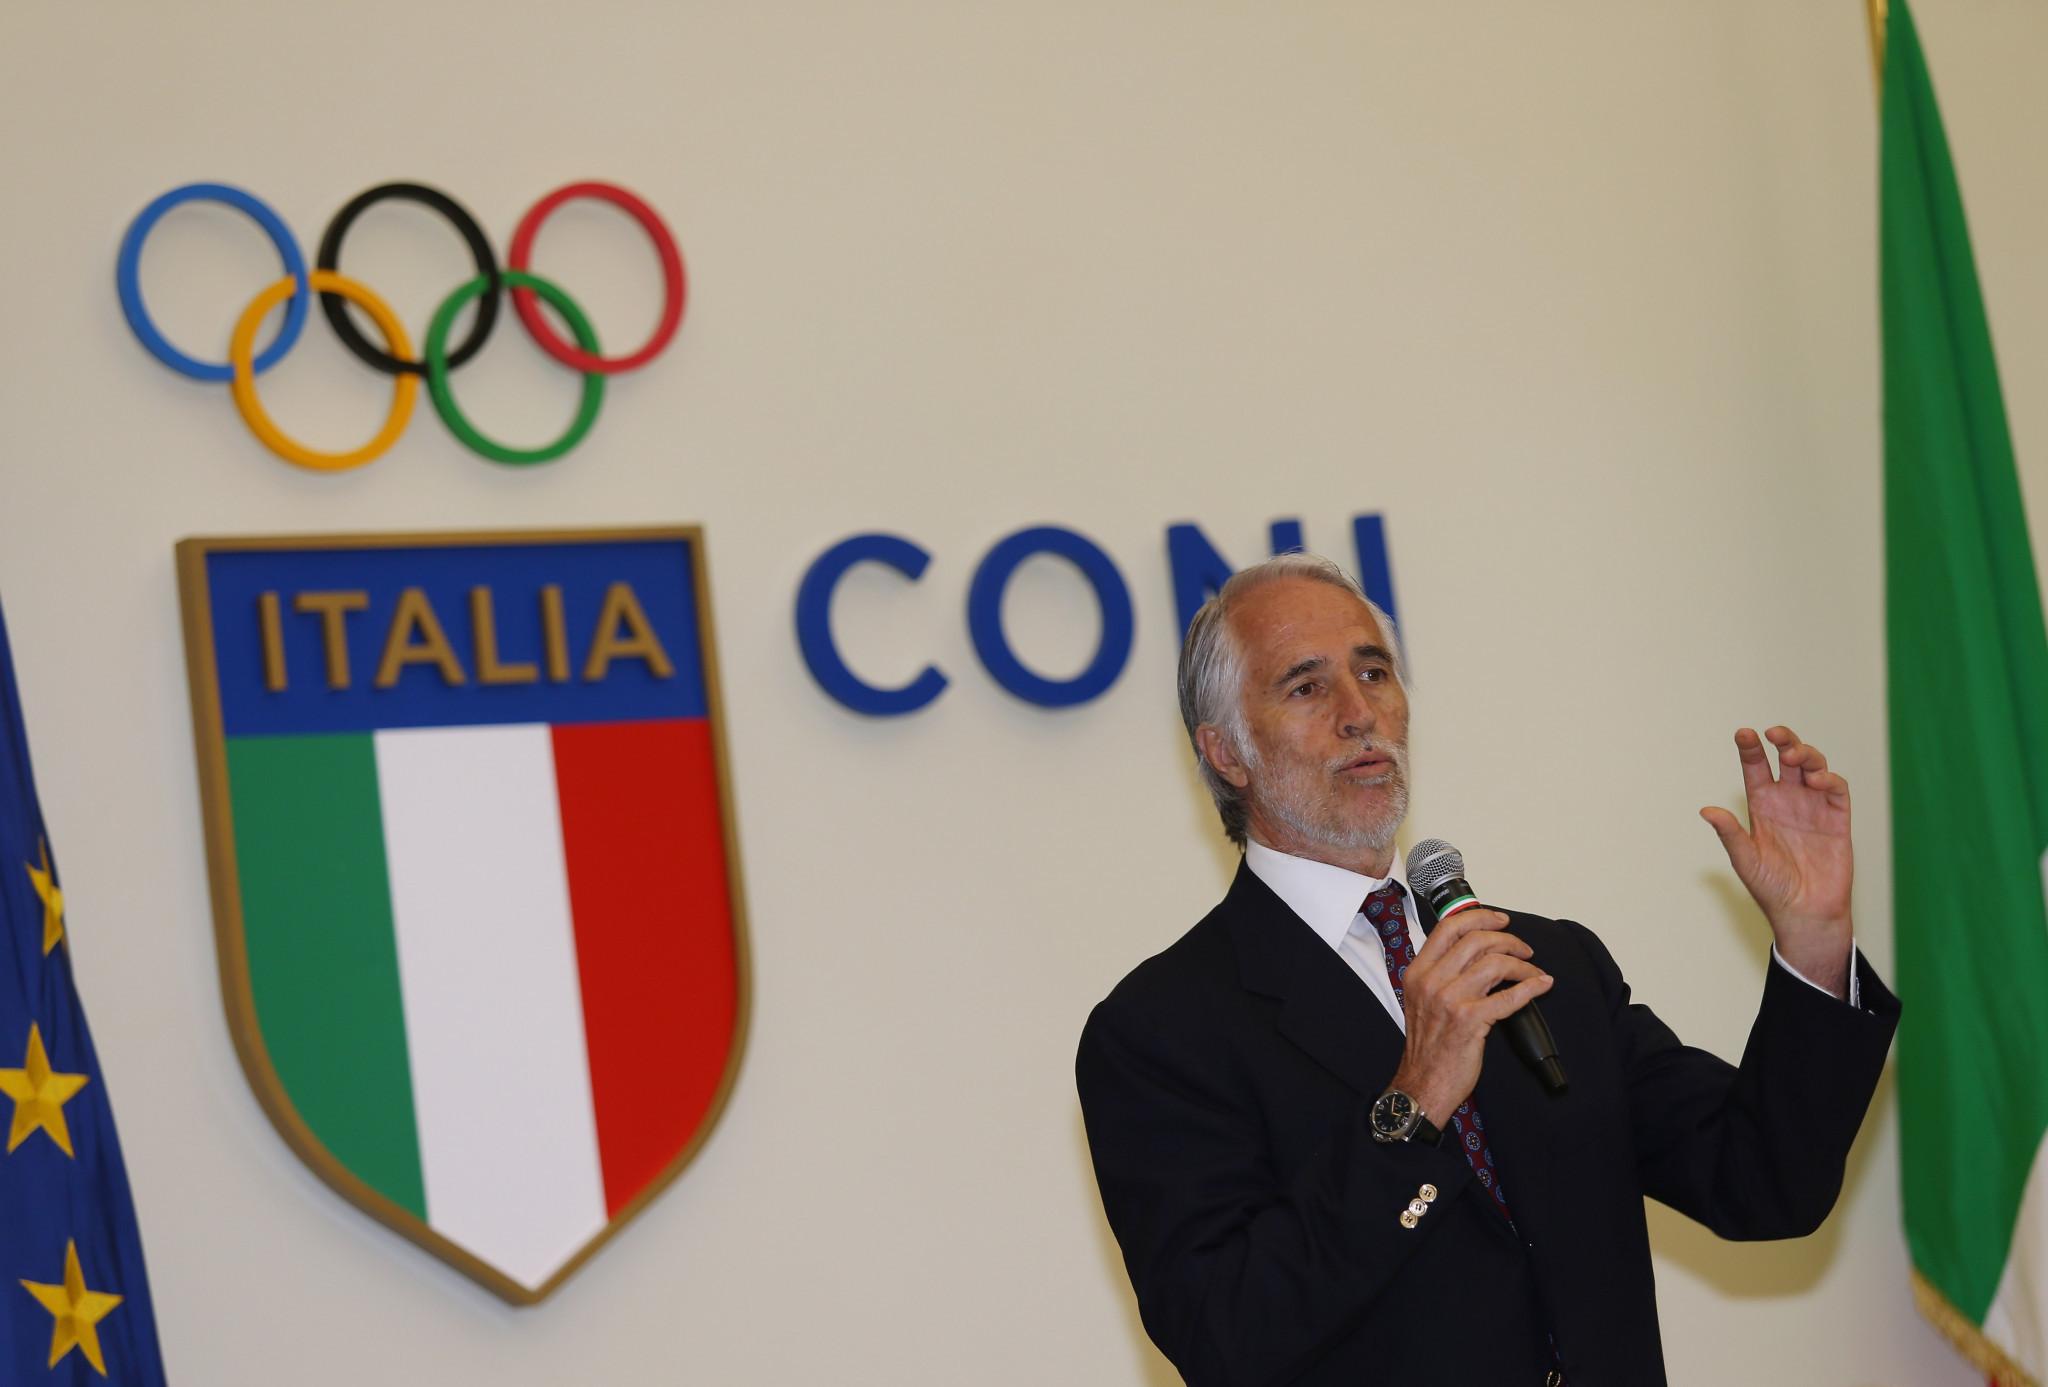 CONI announce July 10 deadline for deciding Italian 2026 Winter Olympic bidding city